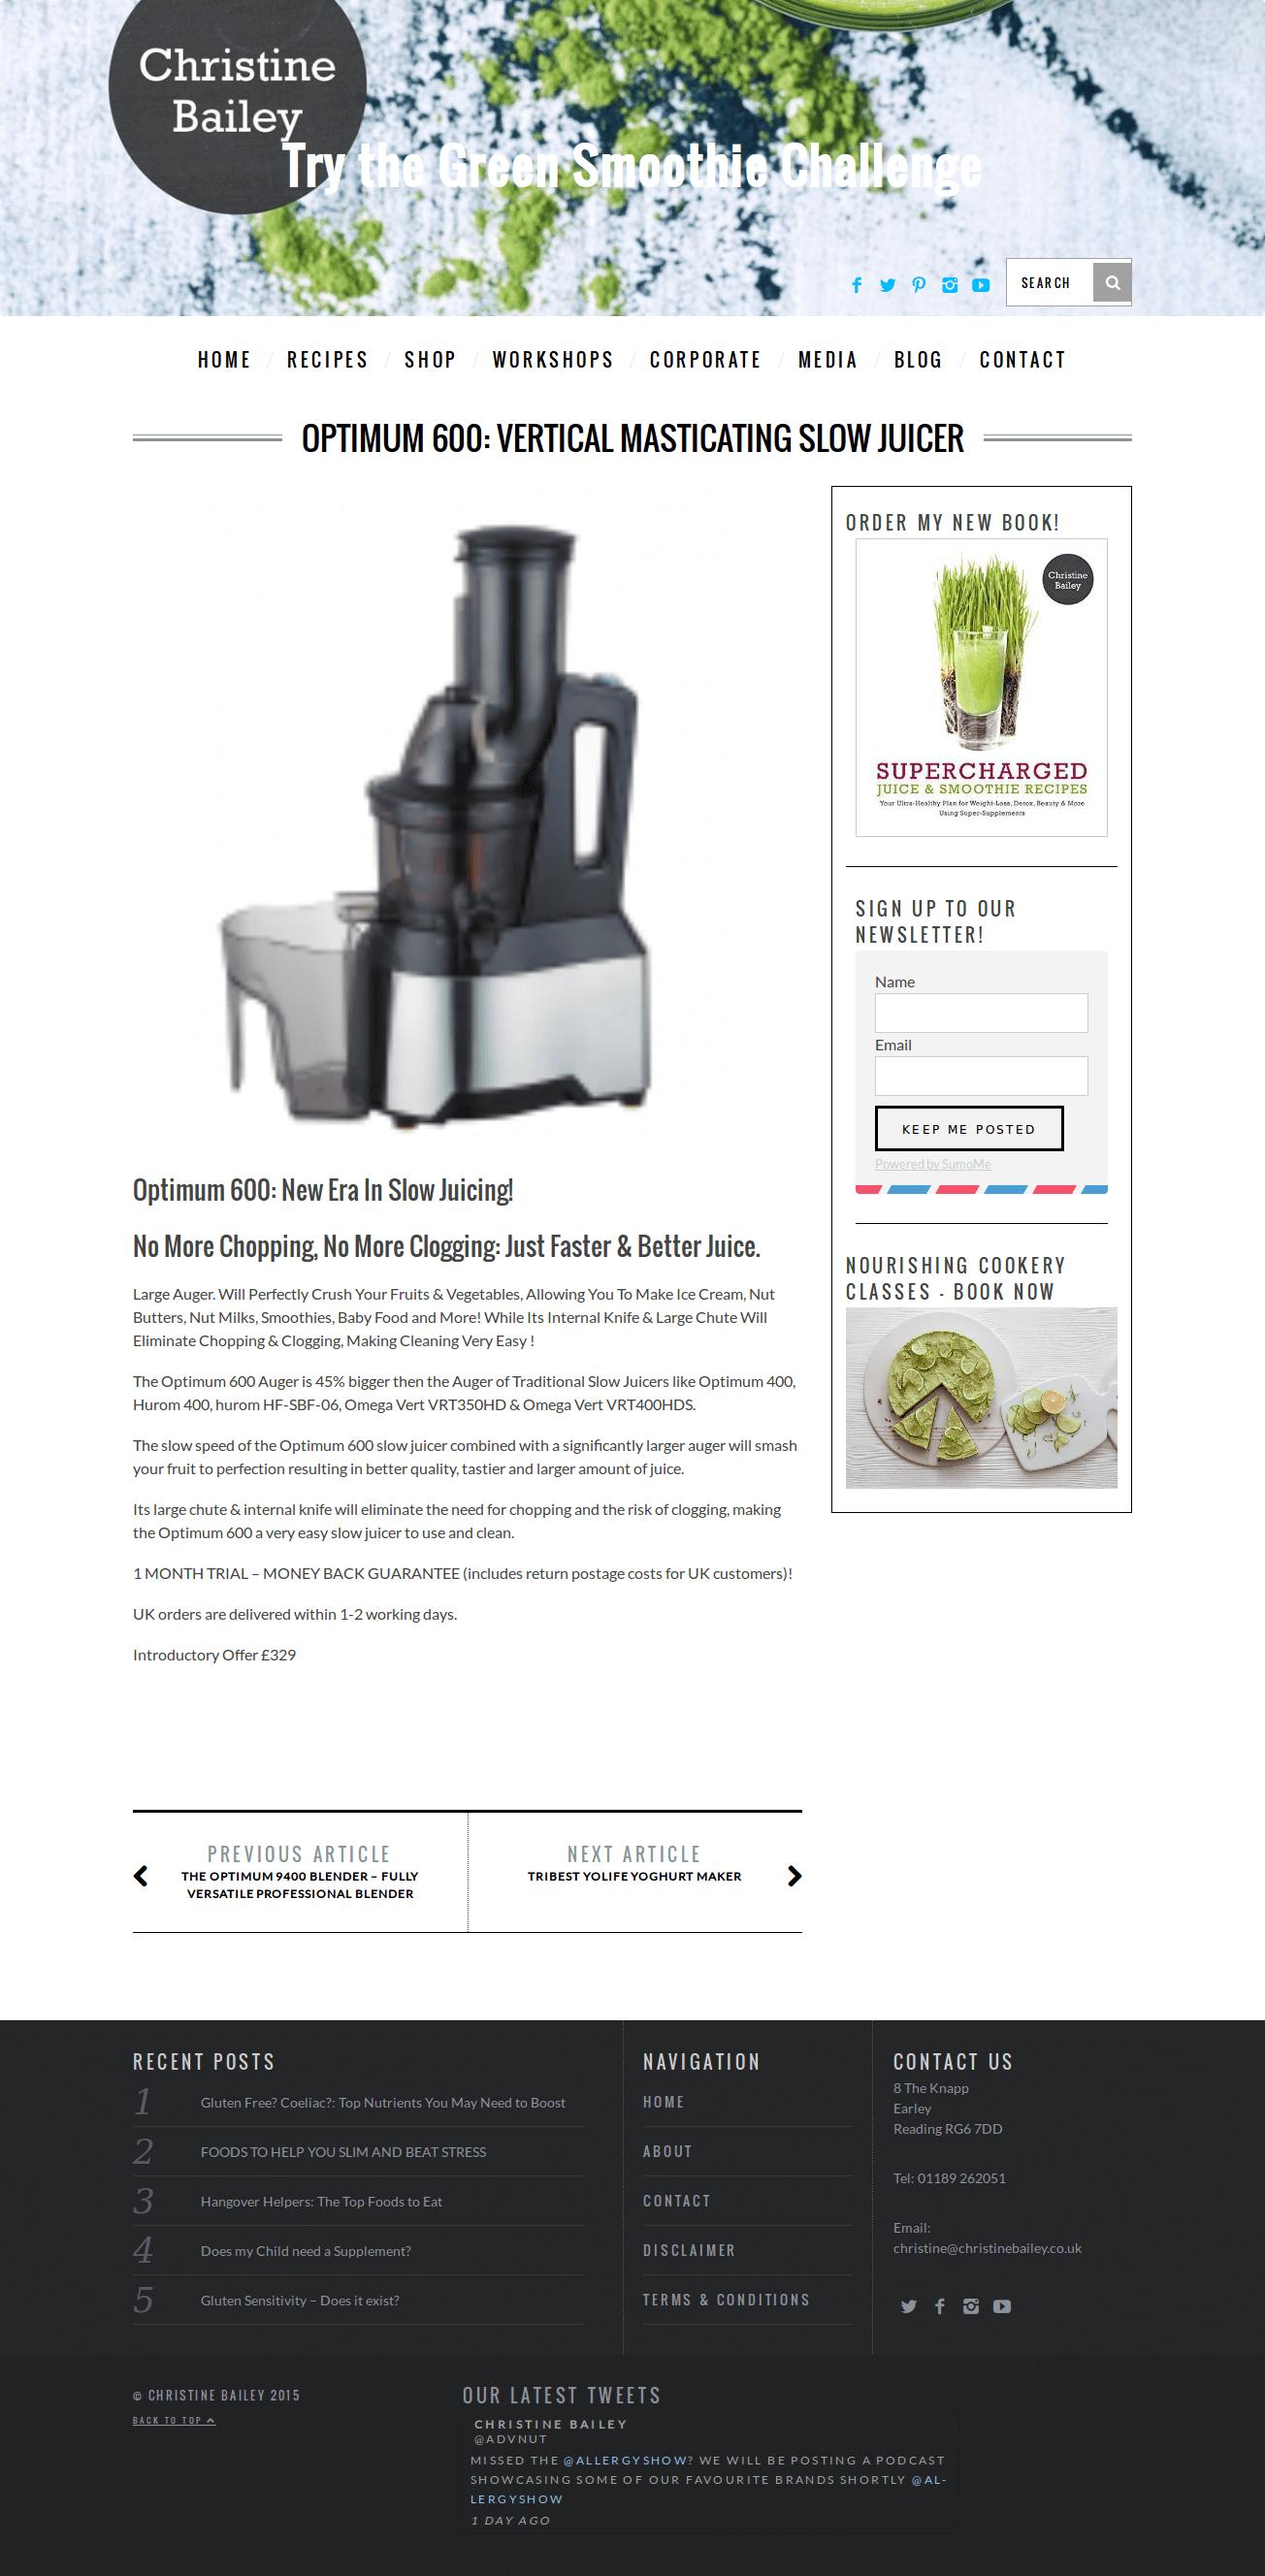 Optimum 400 Slow Juicer Review : Slow juicers :: Optimum 600 : 2016 Best Selling Slow Juicer Large Chute, No Prep, Delicious Juice.